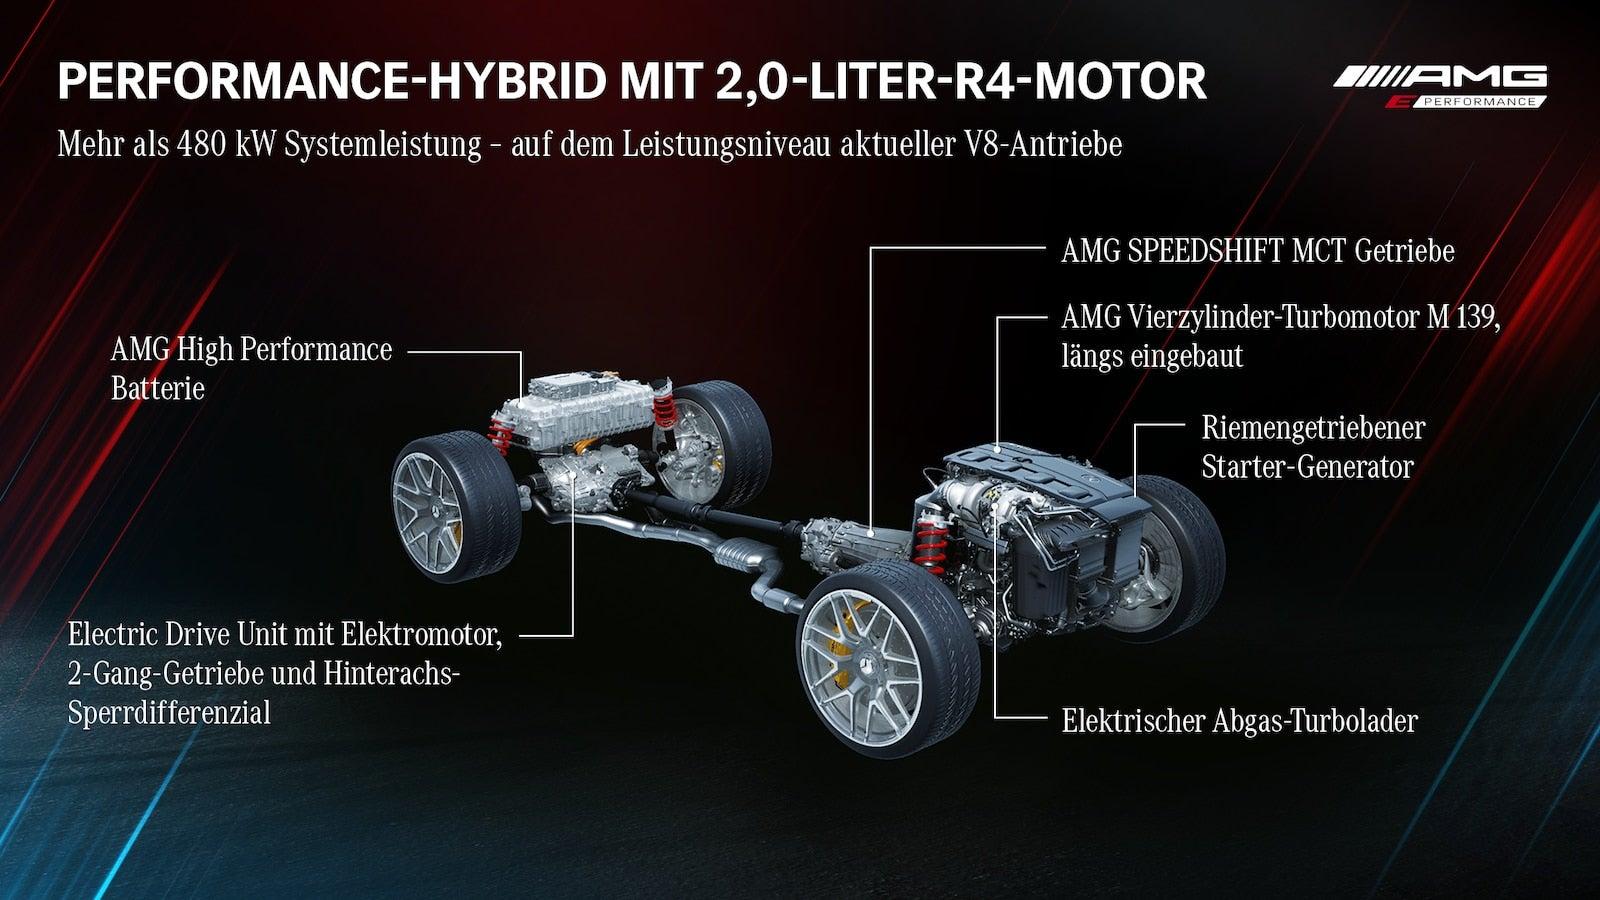 Mercedes-AMG hybrid infographic